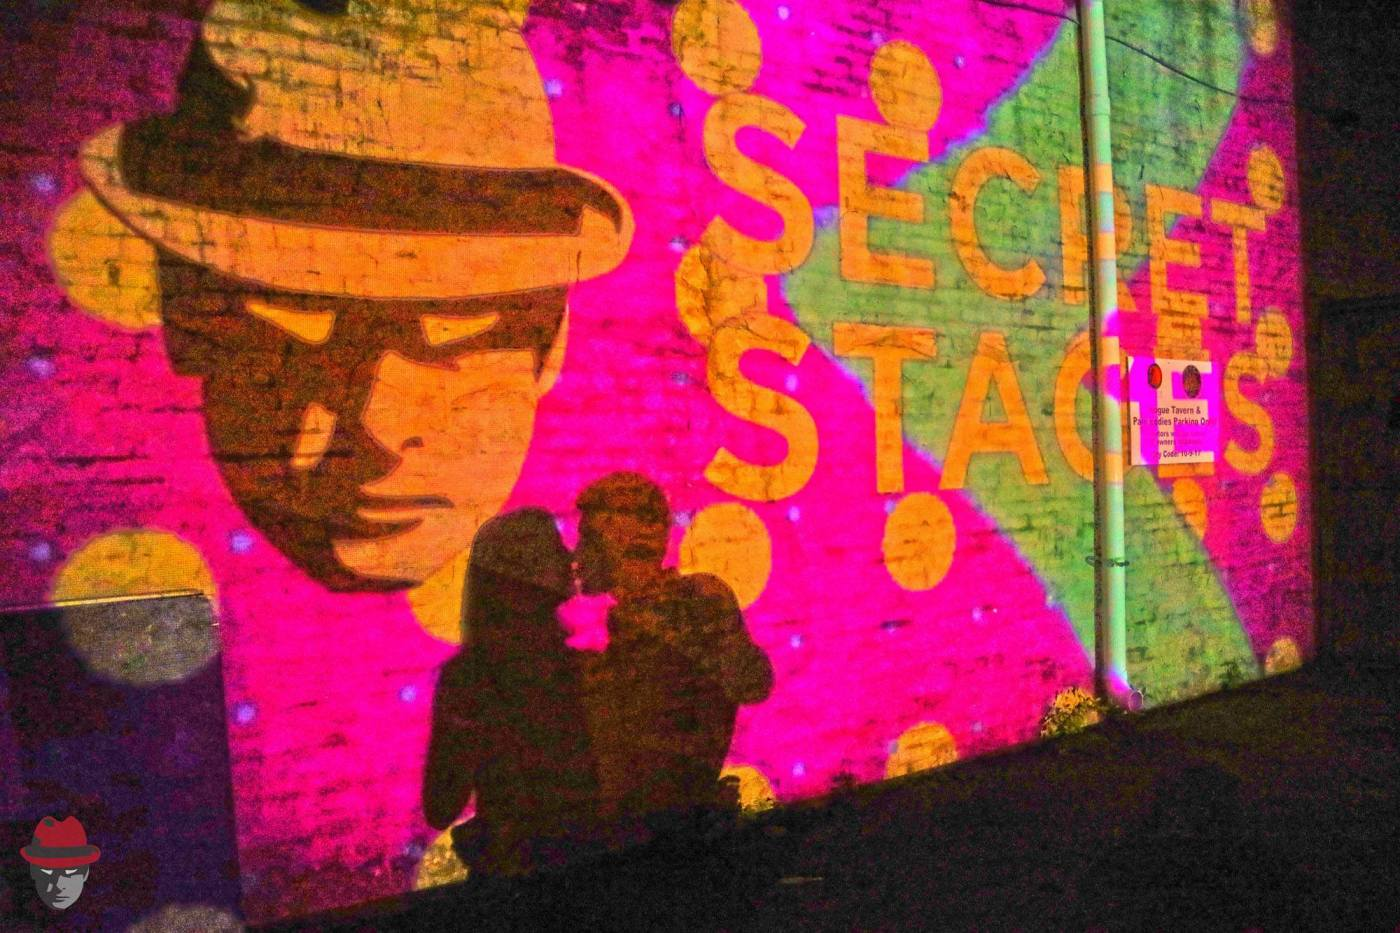 Secret Stages digital projection